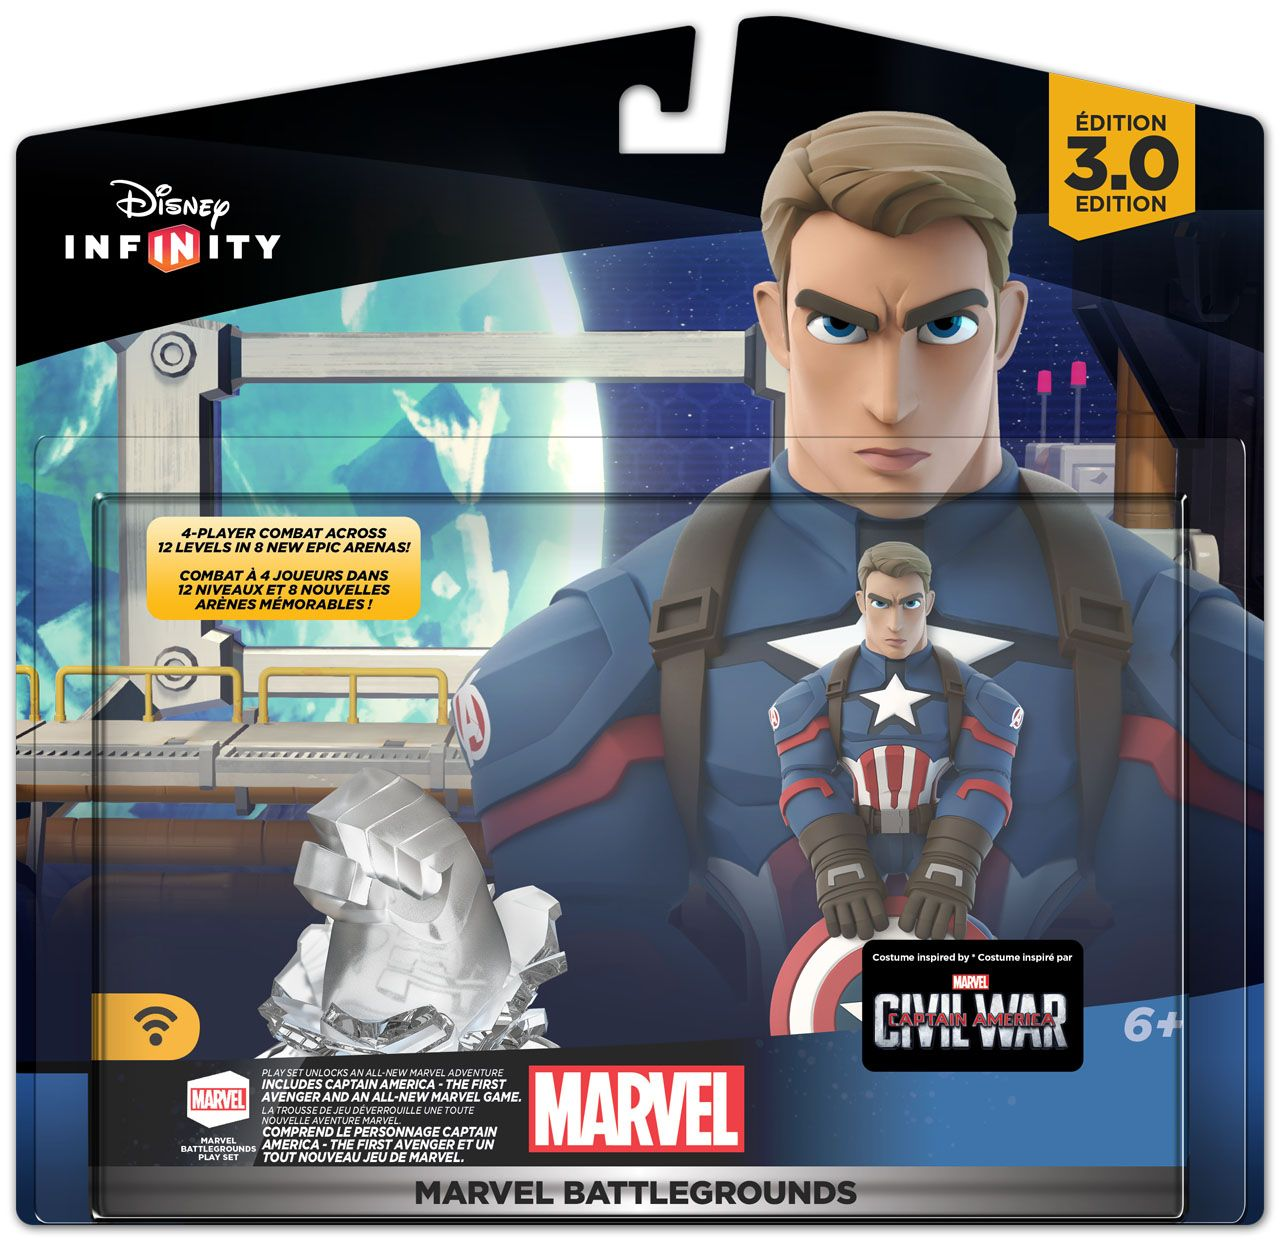 Disney Infinity 3.0 Next Disney infinity characters